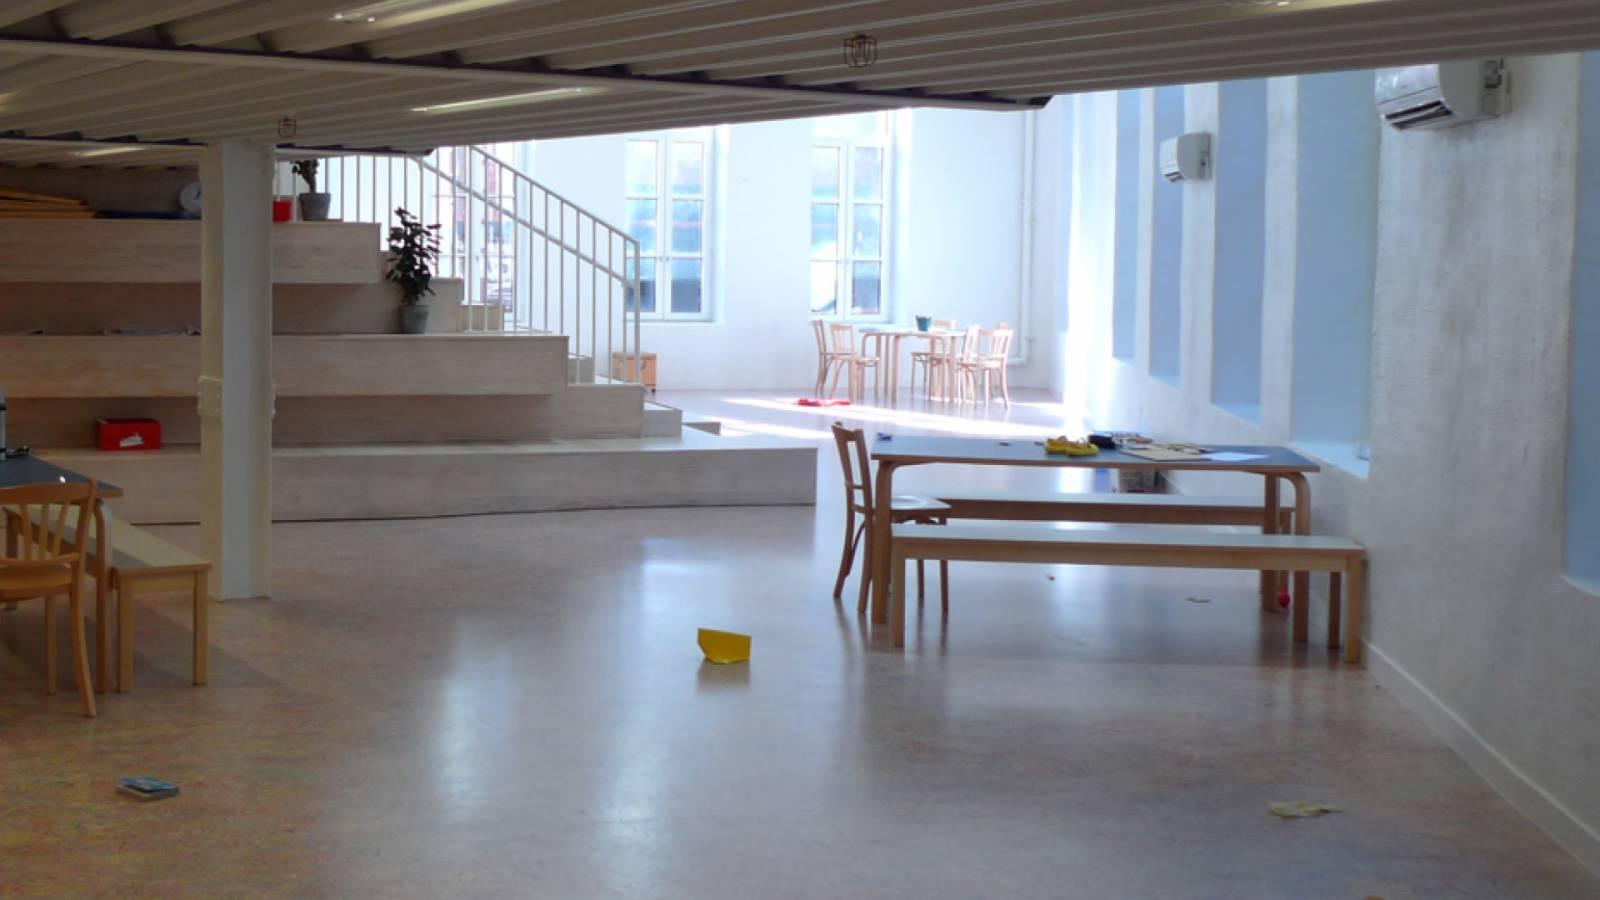 UNDER MEZZANINE - Ny York Cultural kindergarten - SPOL Architects